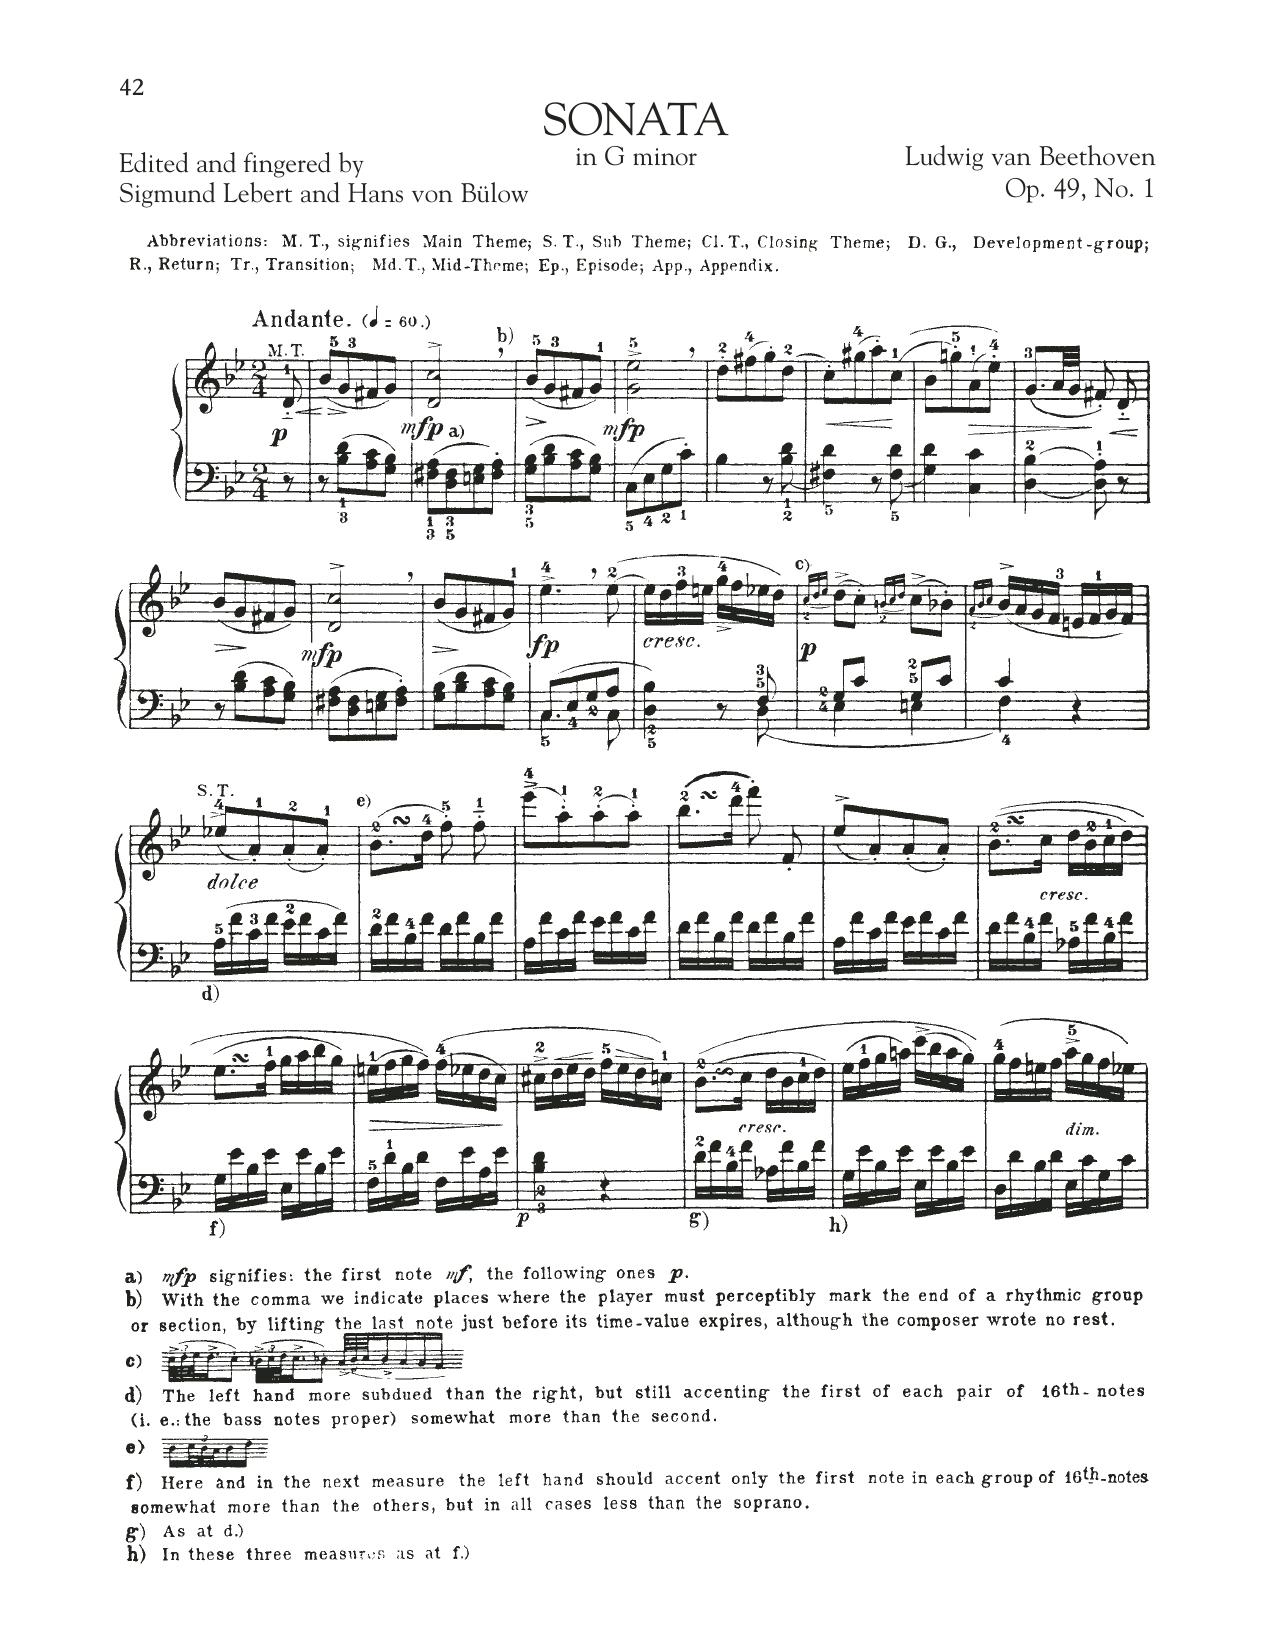 Sonata in G Minor, Op. 49, No. 1 Sheet Music